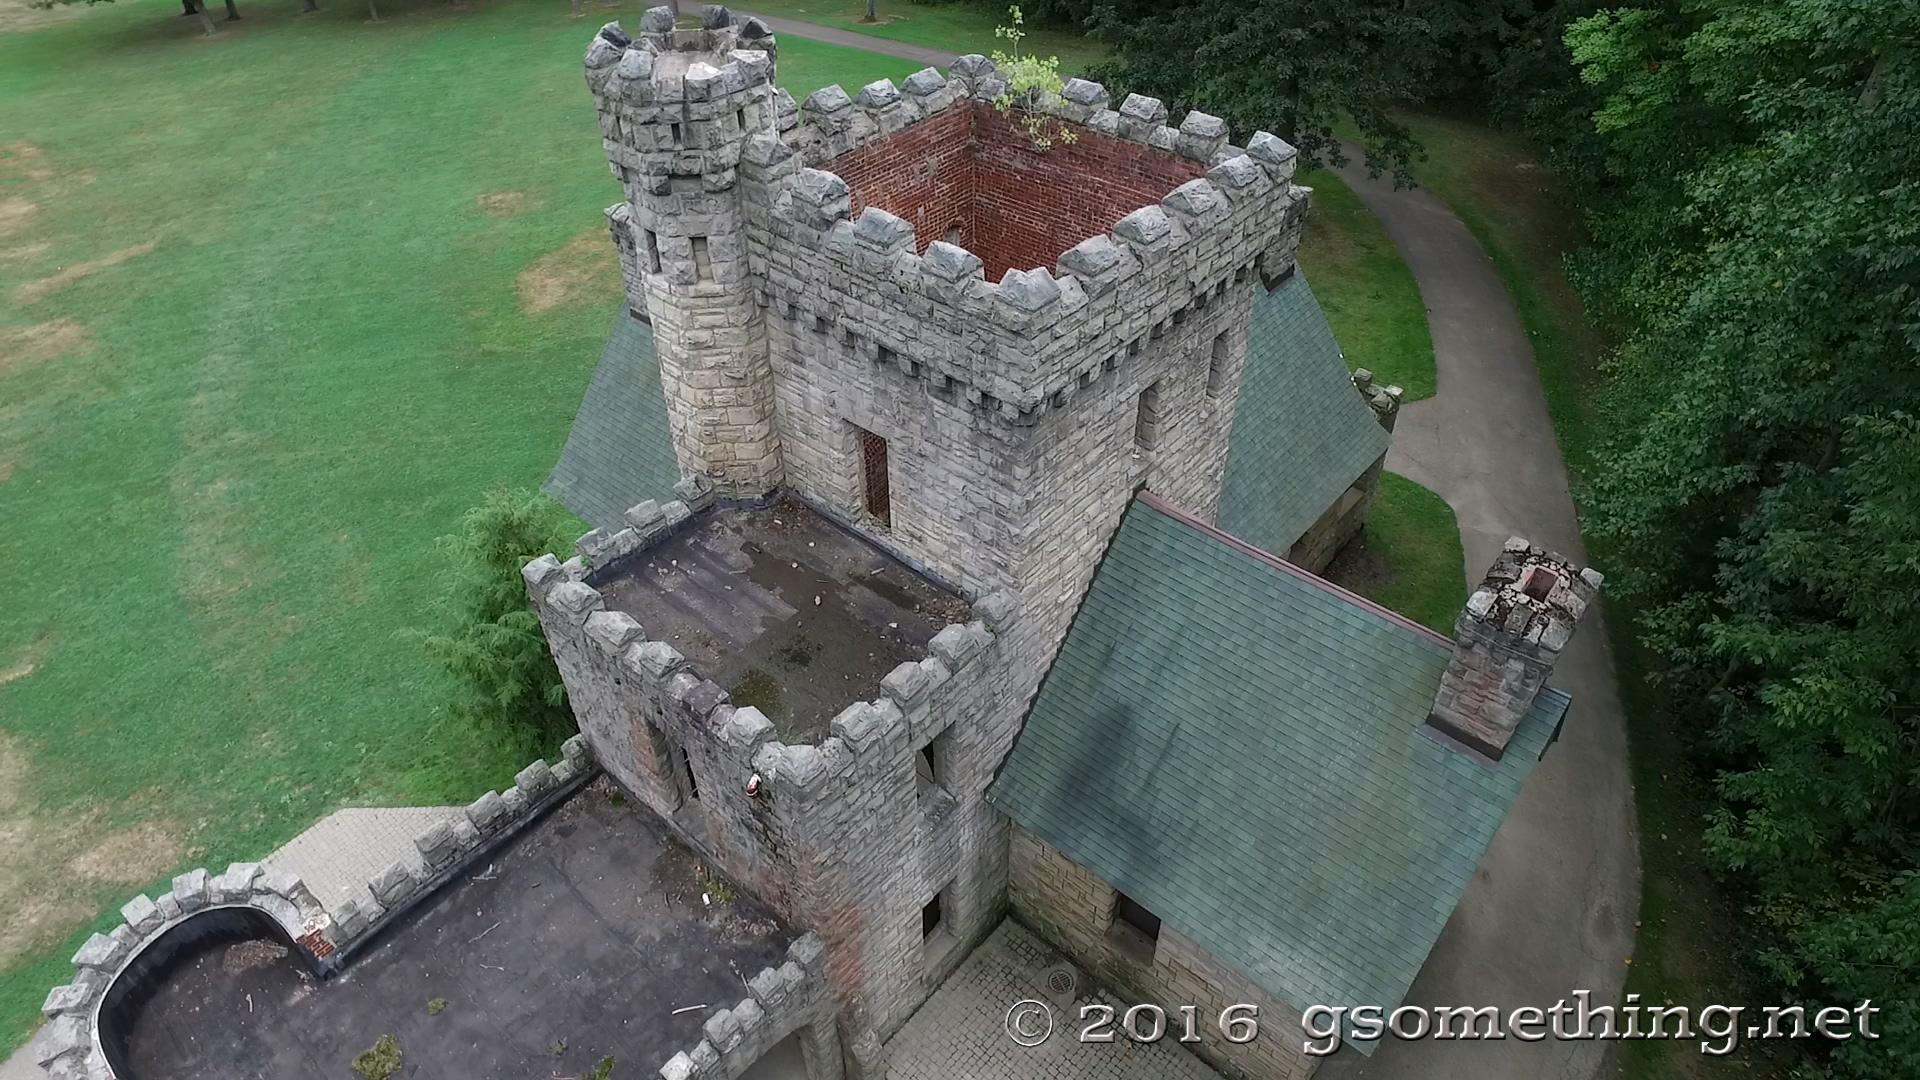 squires_castle_5.jpg